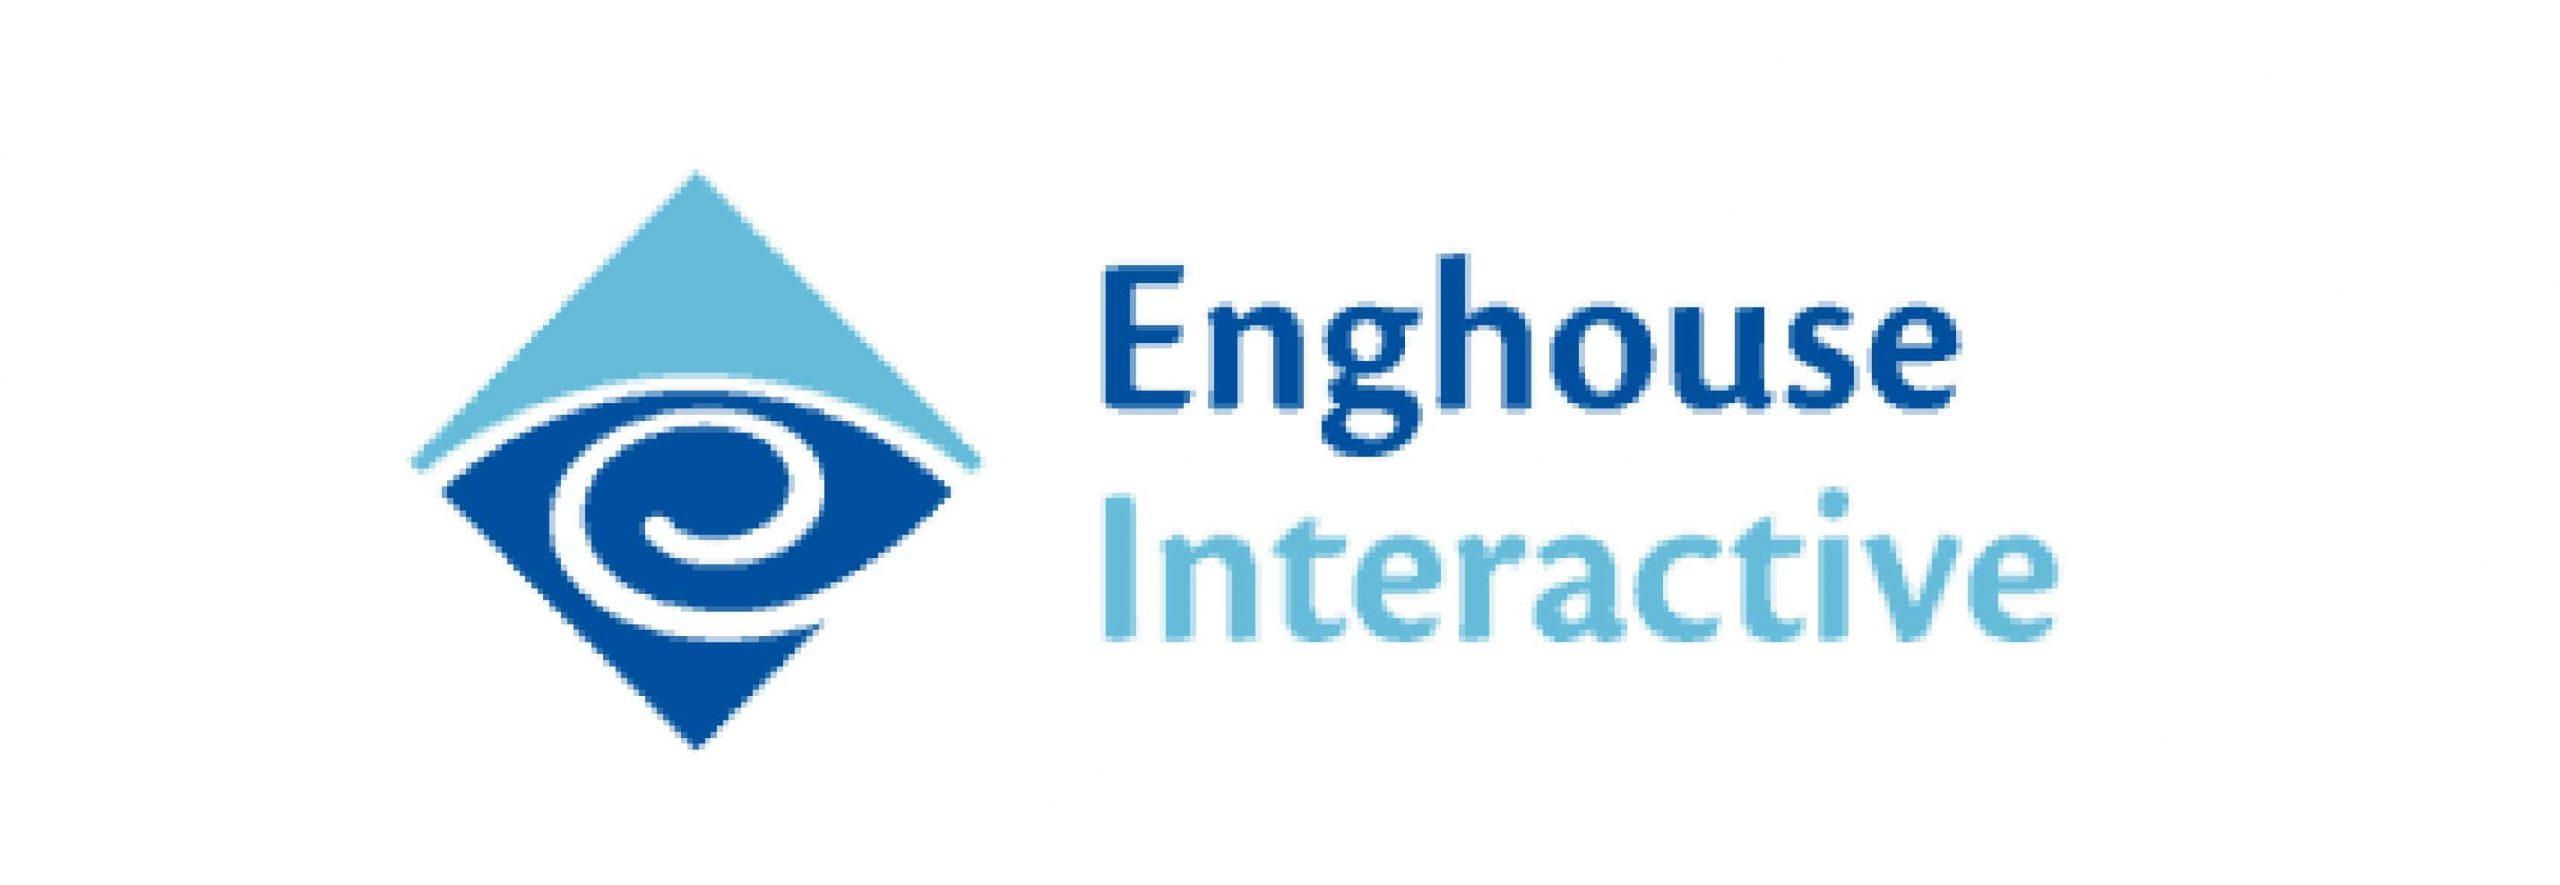 enghouse interactive-01-min